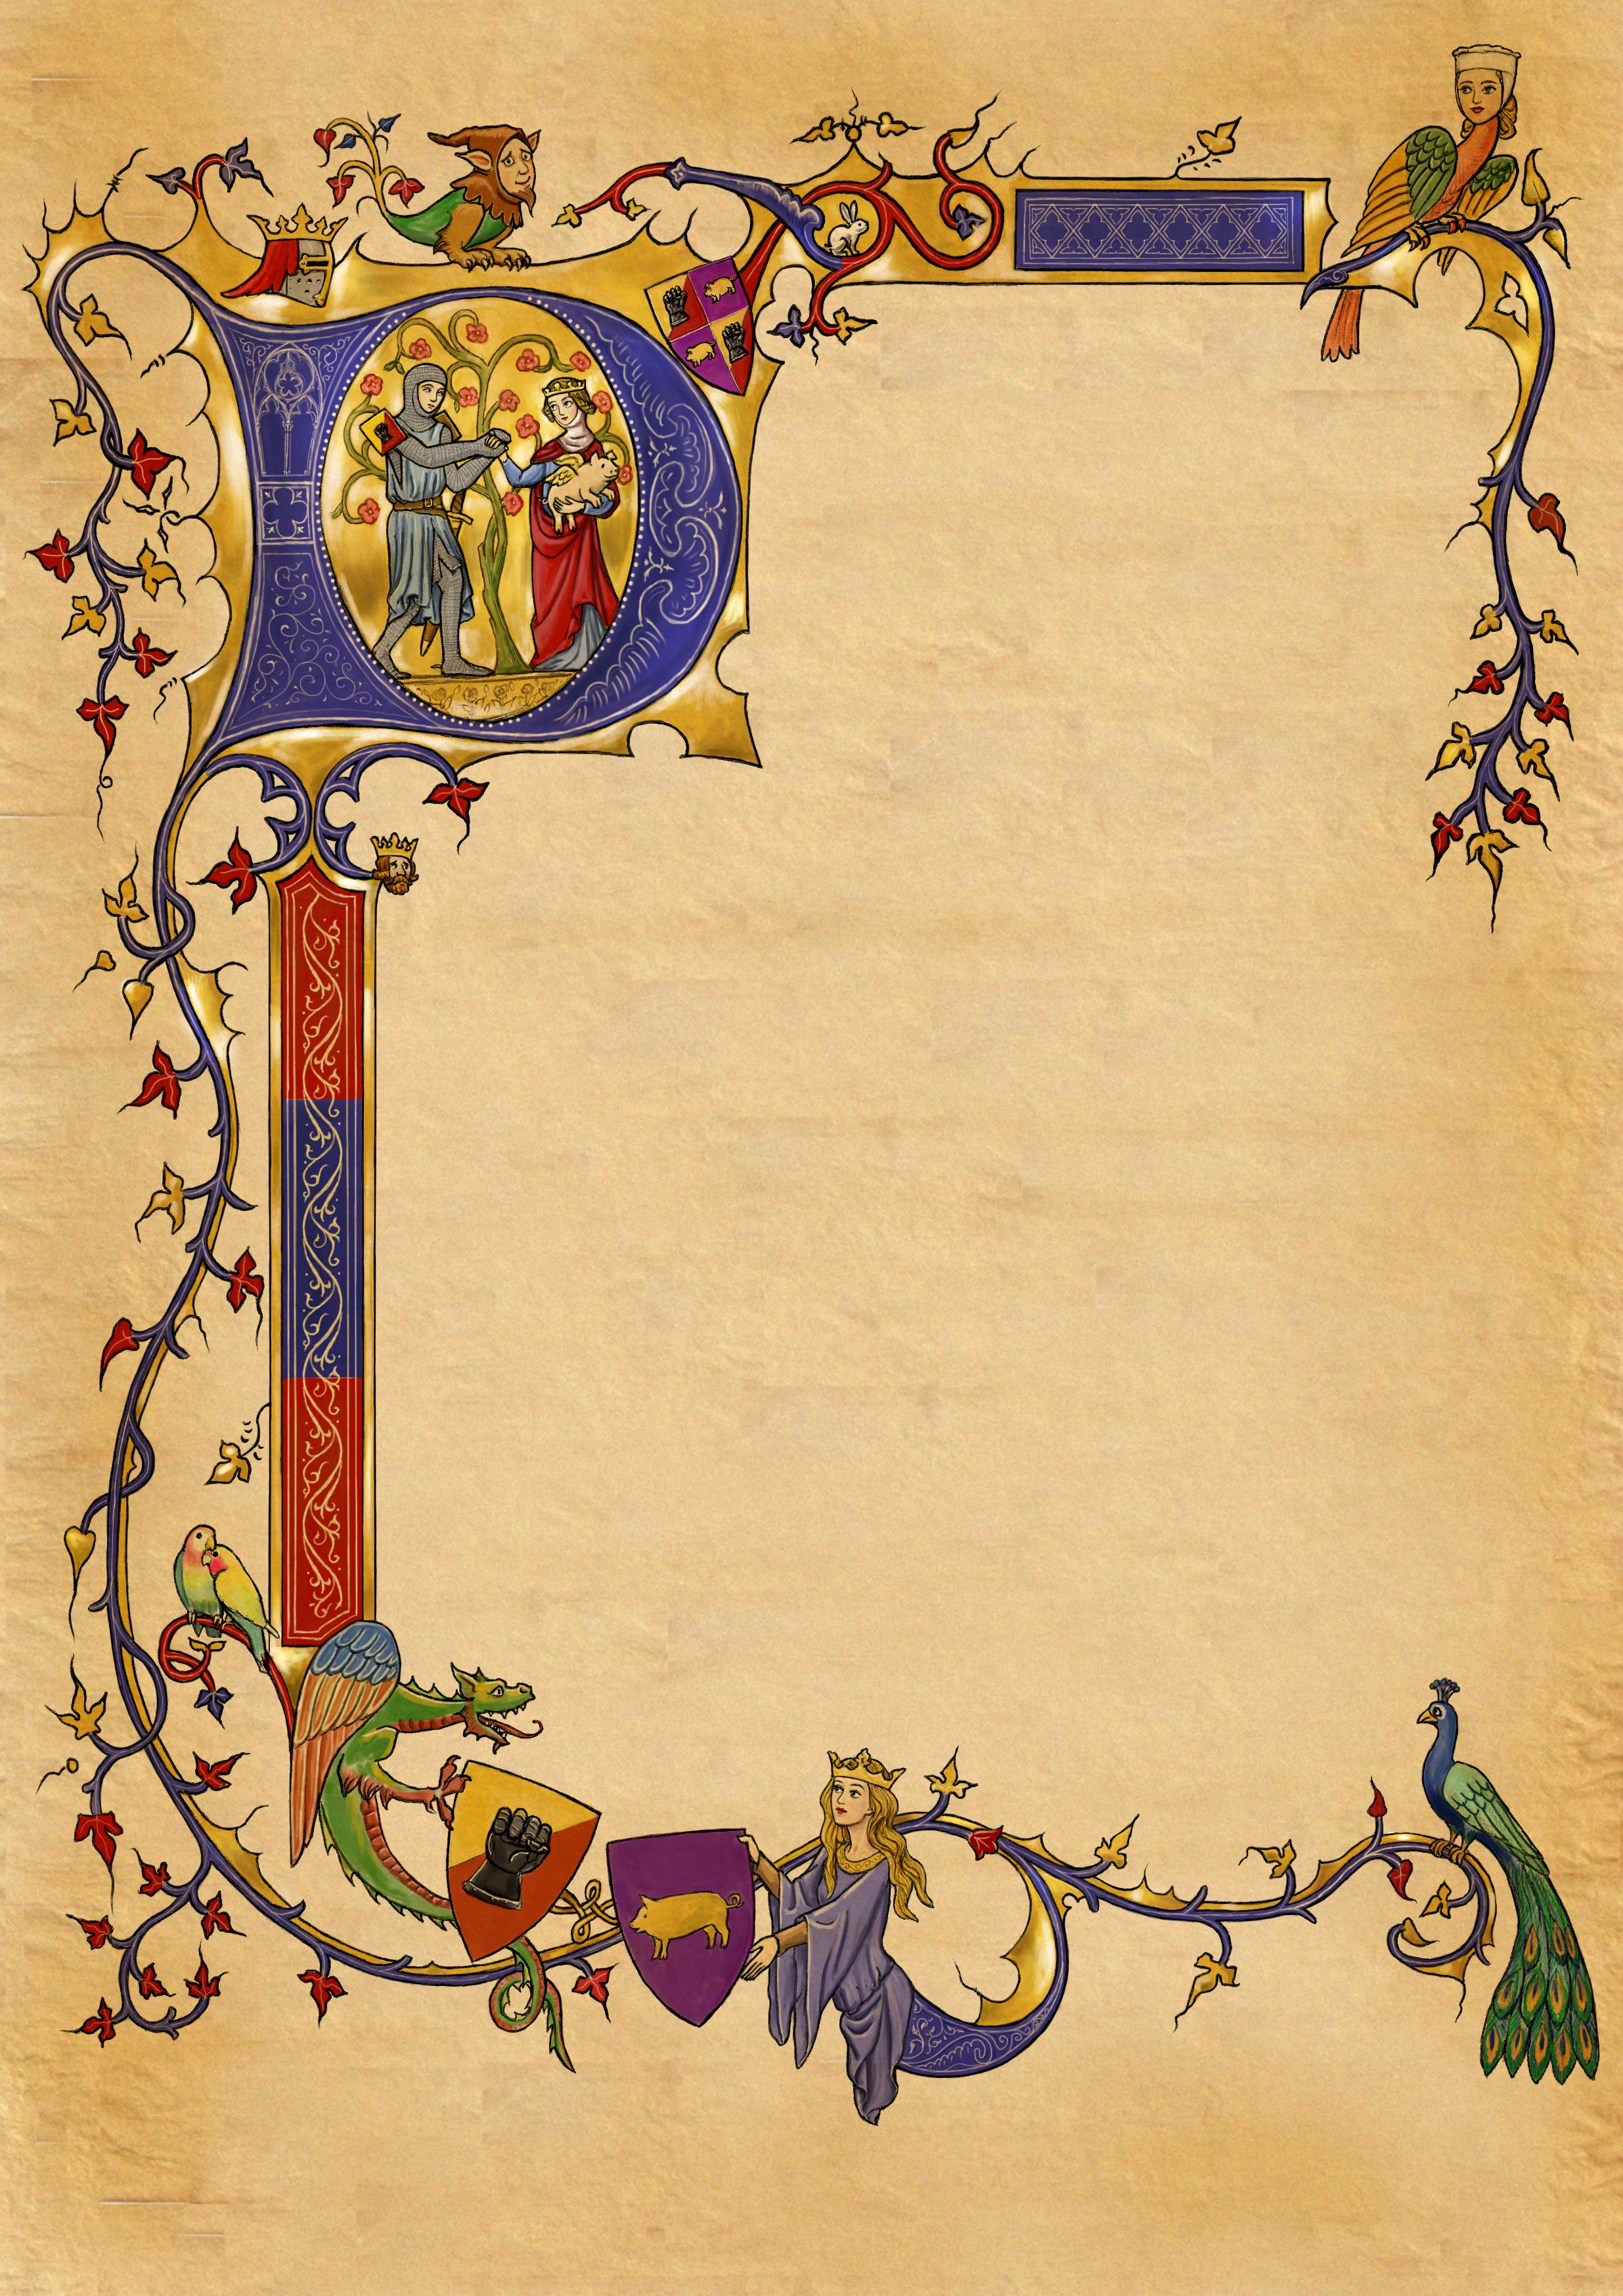 Banner clipart medieval. Illuminated border look at